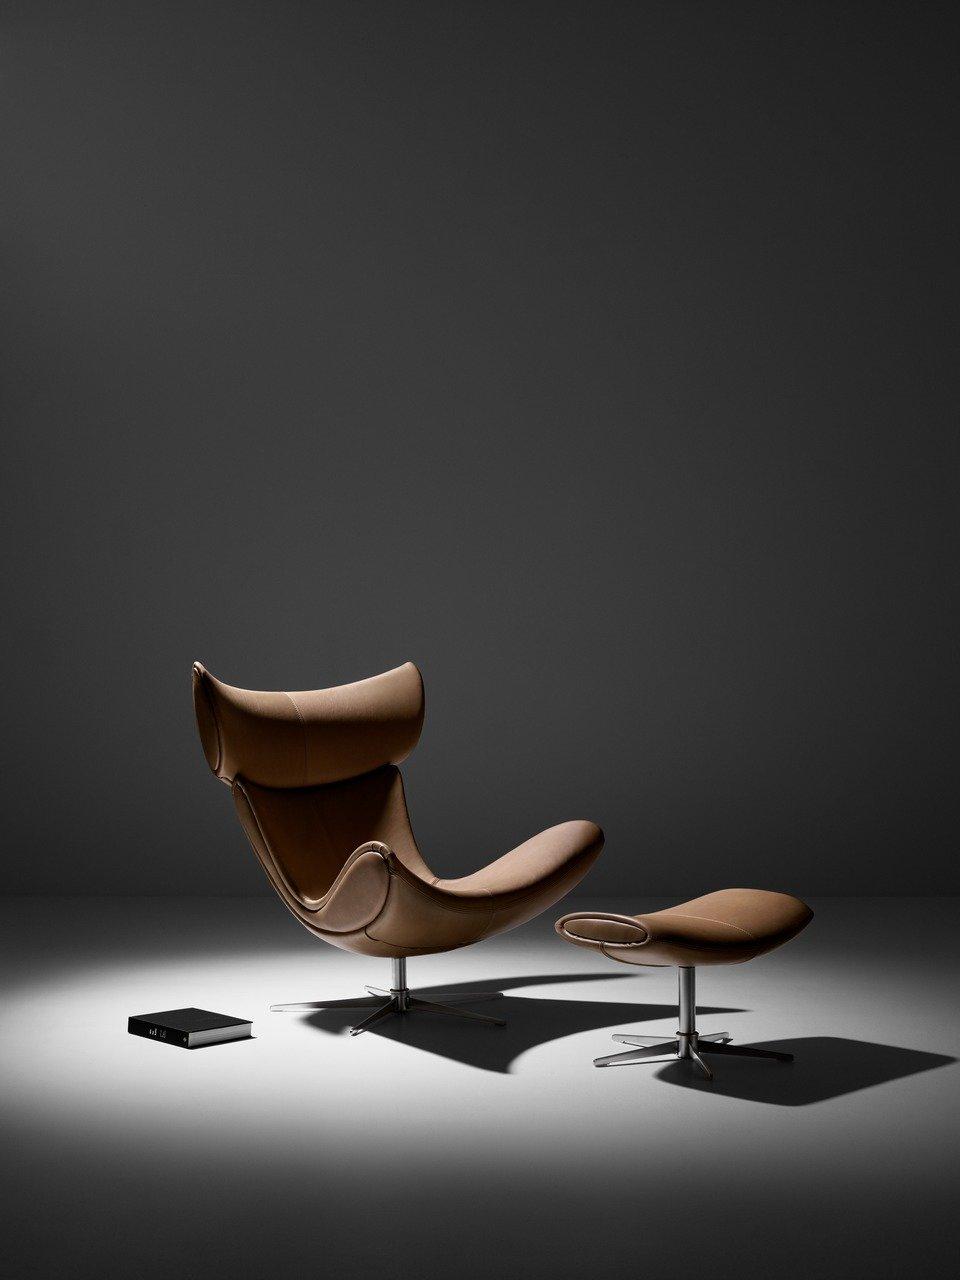 23133_Imola chair with swivel function_10002_4.jpg